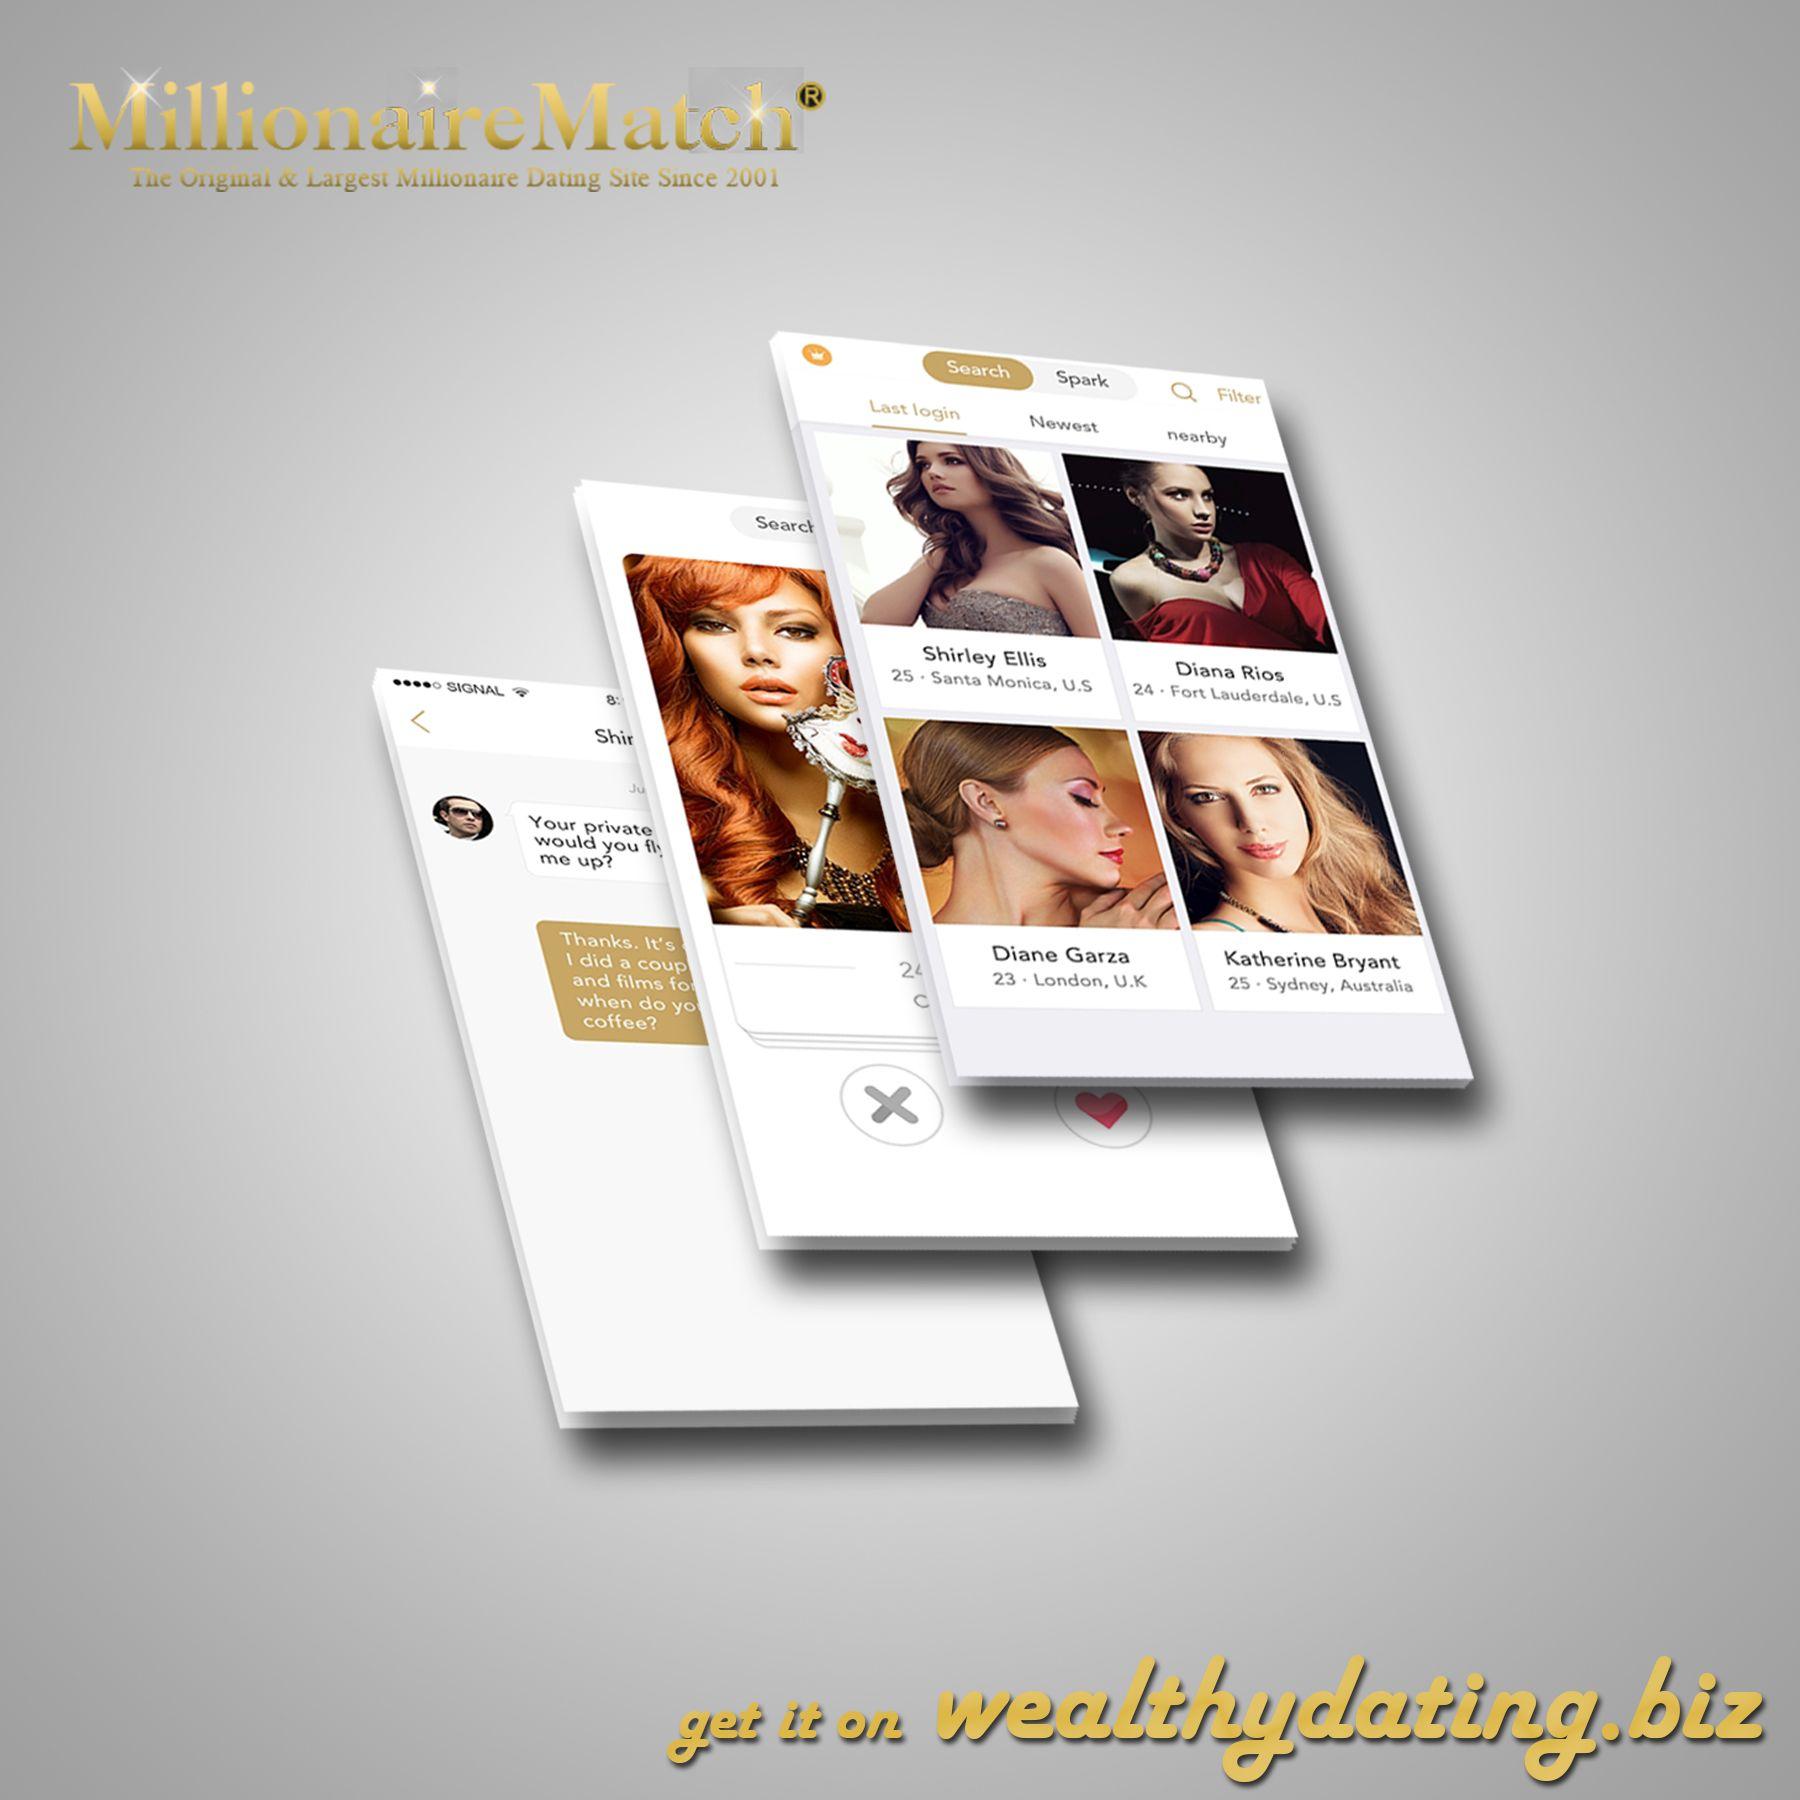 Dating sites for millionaires in australia